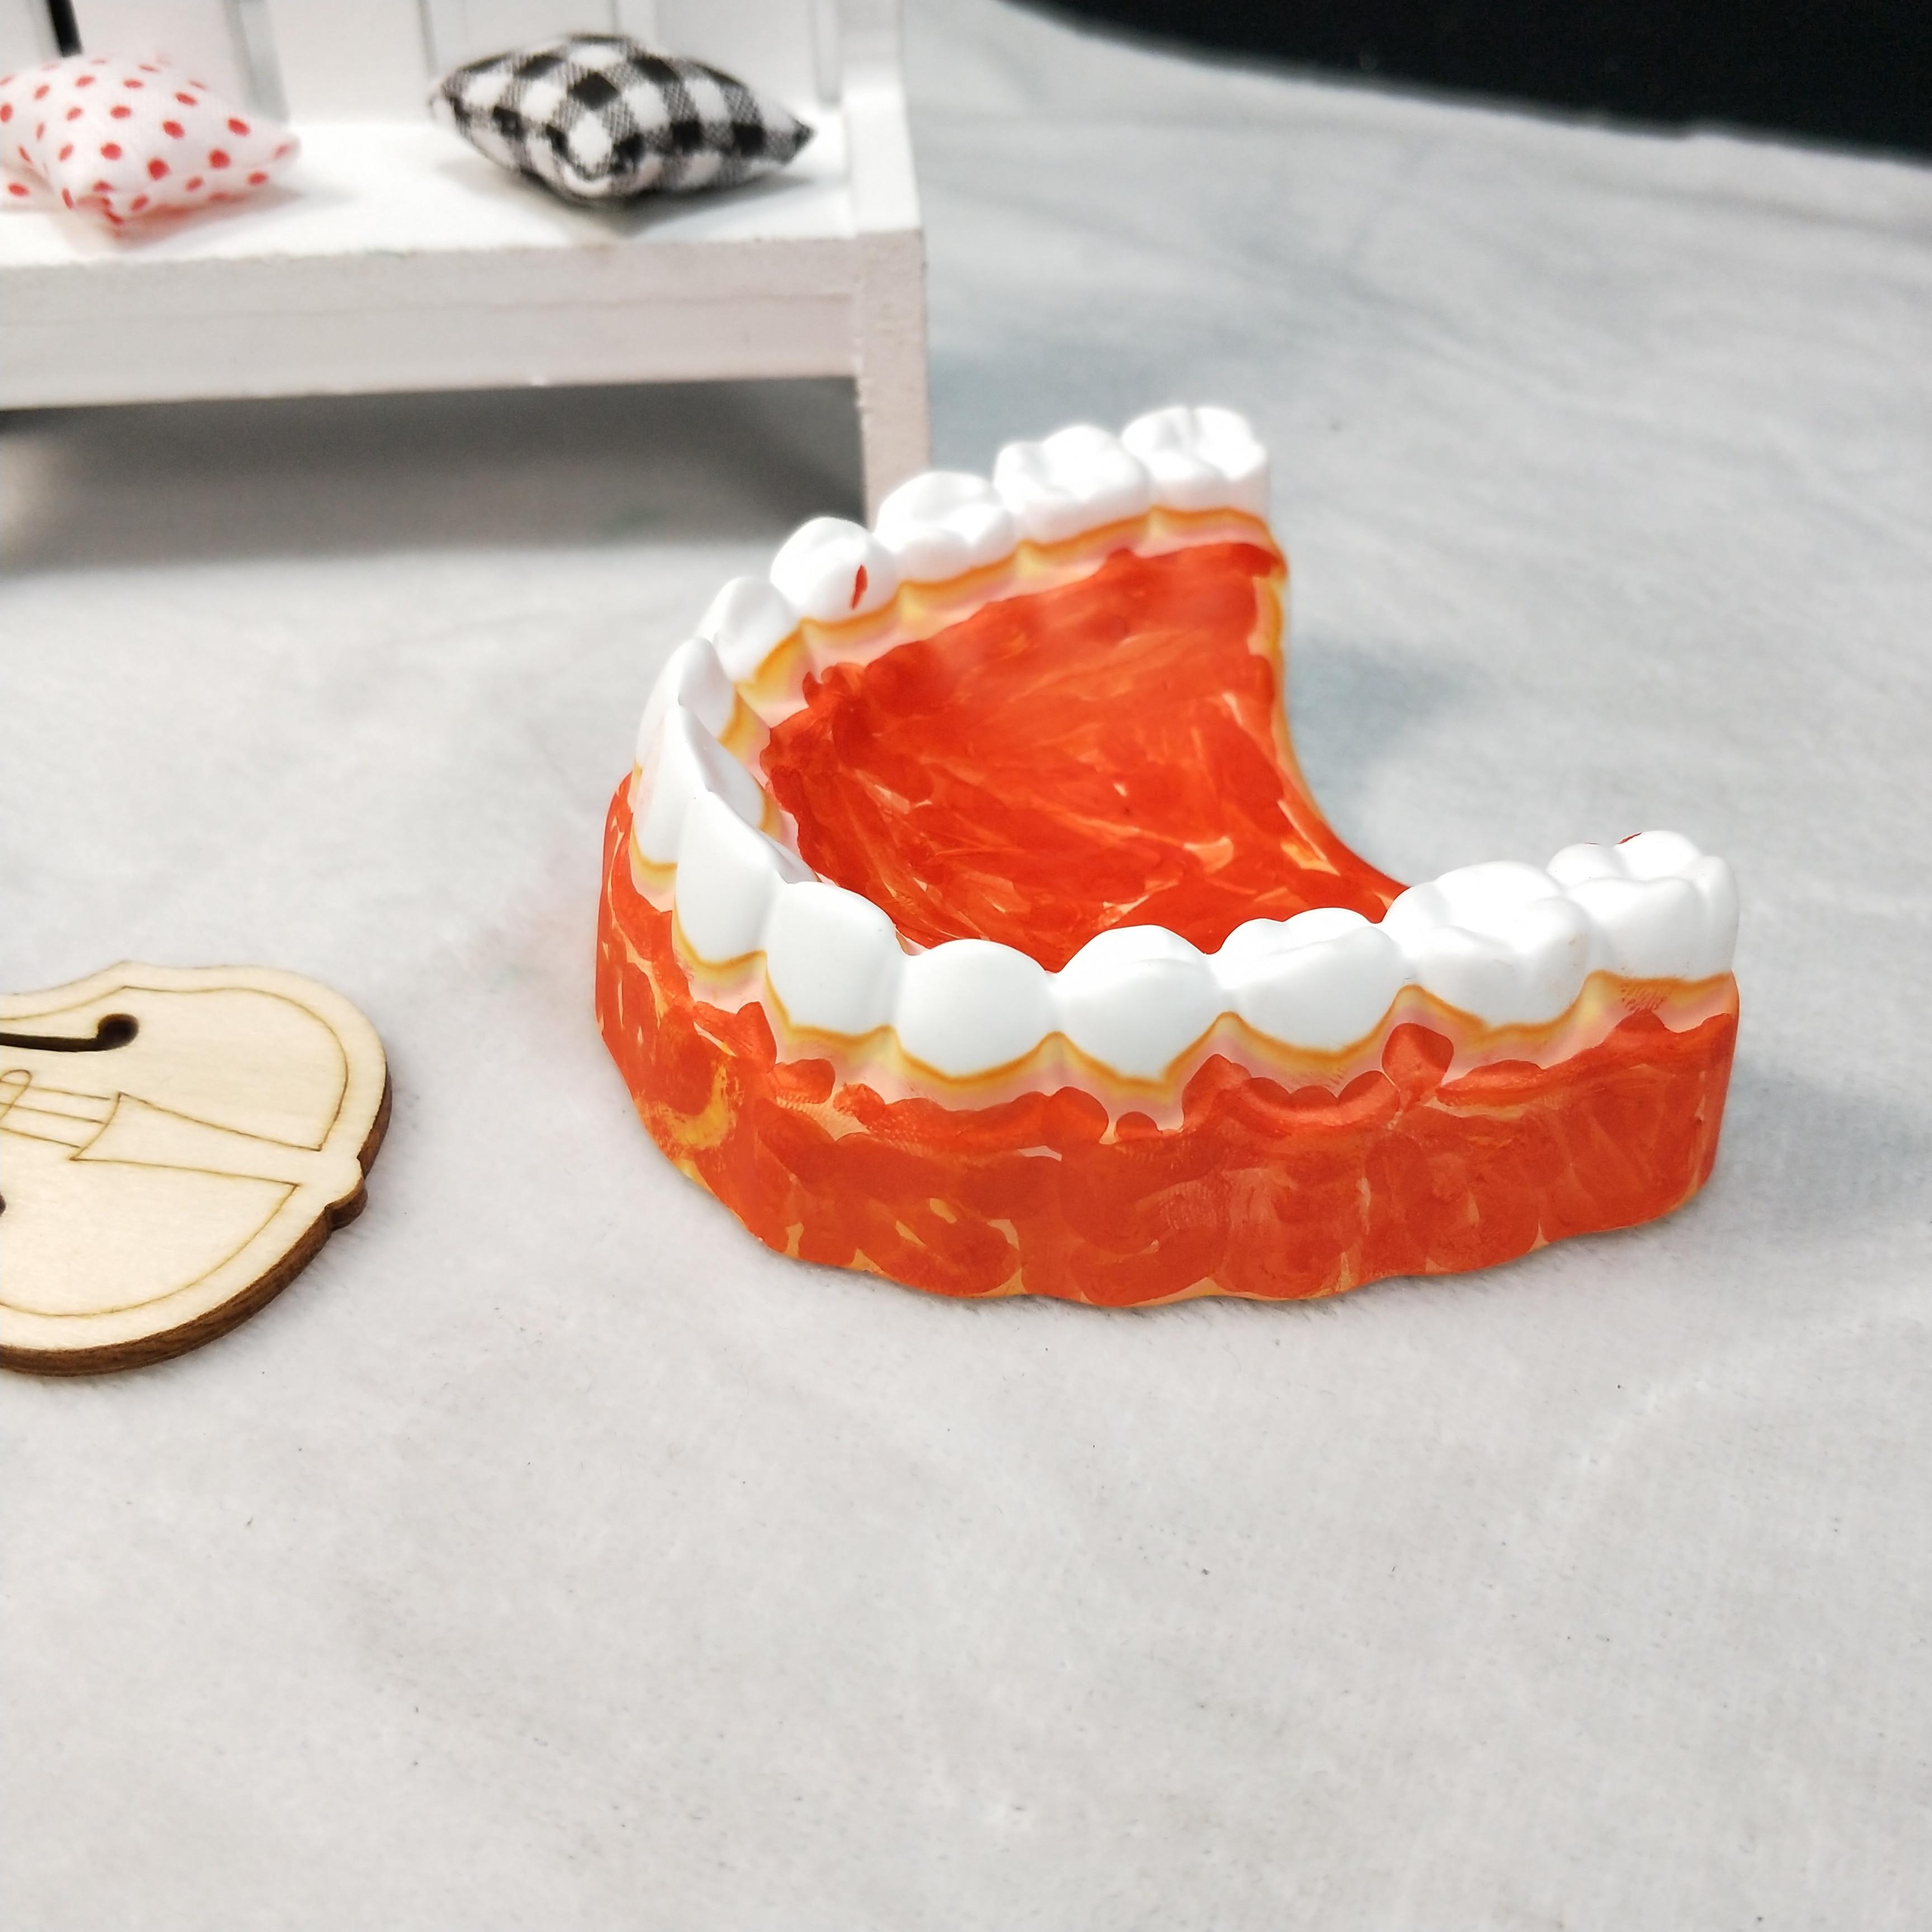 Molde de silicona QT0272 PRZY, moldes de jabón para encías, molde de jabón para dentadura, moldes para velas de Chocolate y yeso, molde de jabón, resina de arcilla ecológica